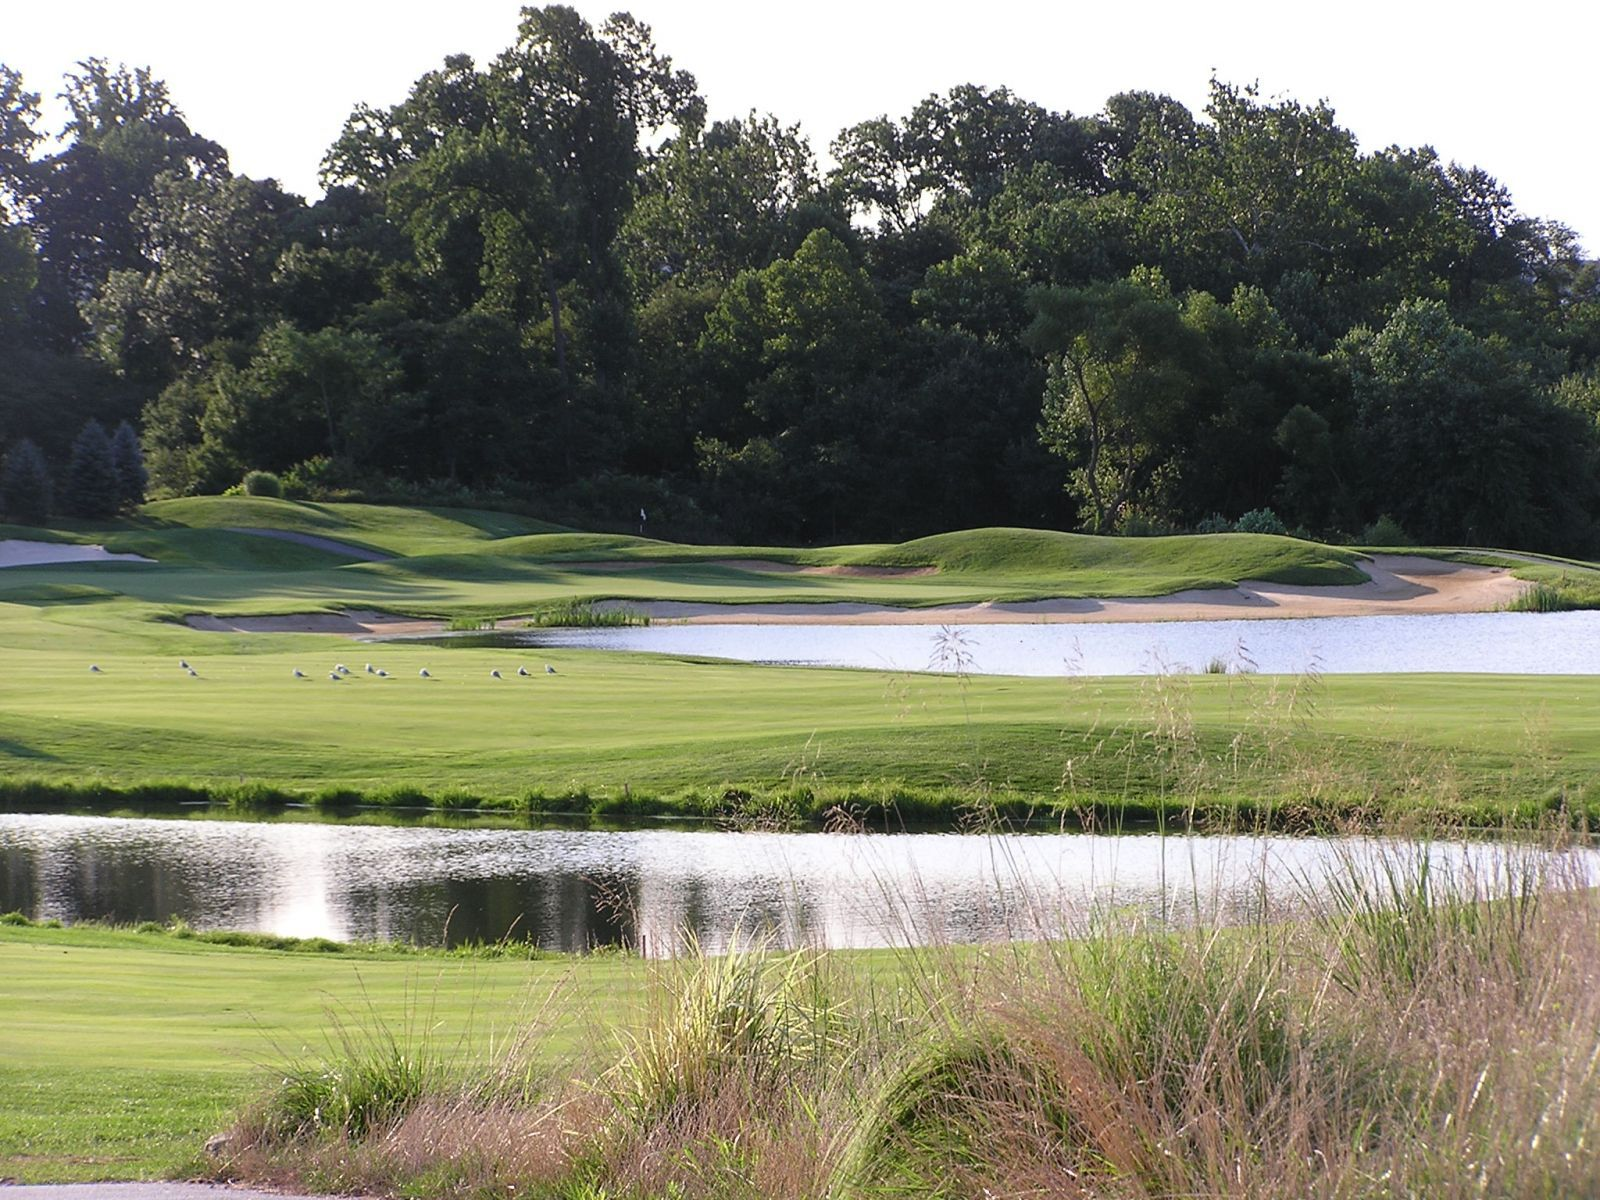 Laurel Creek Country Club Mount Laurel Nj Mount Laurel Golf Courses Laurel